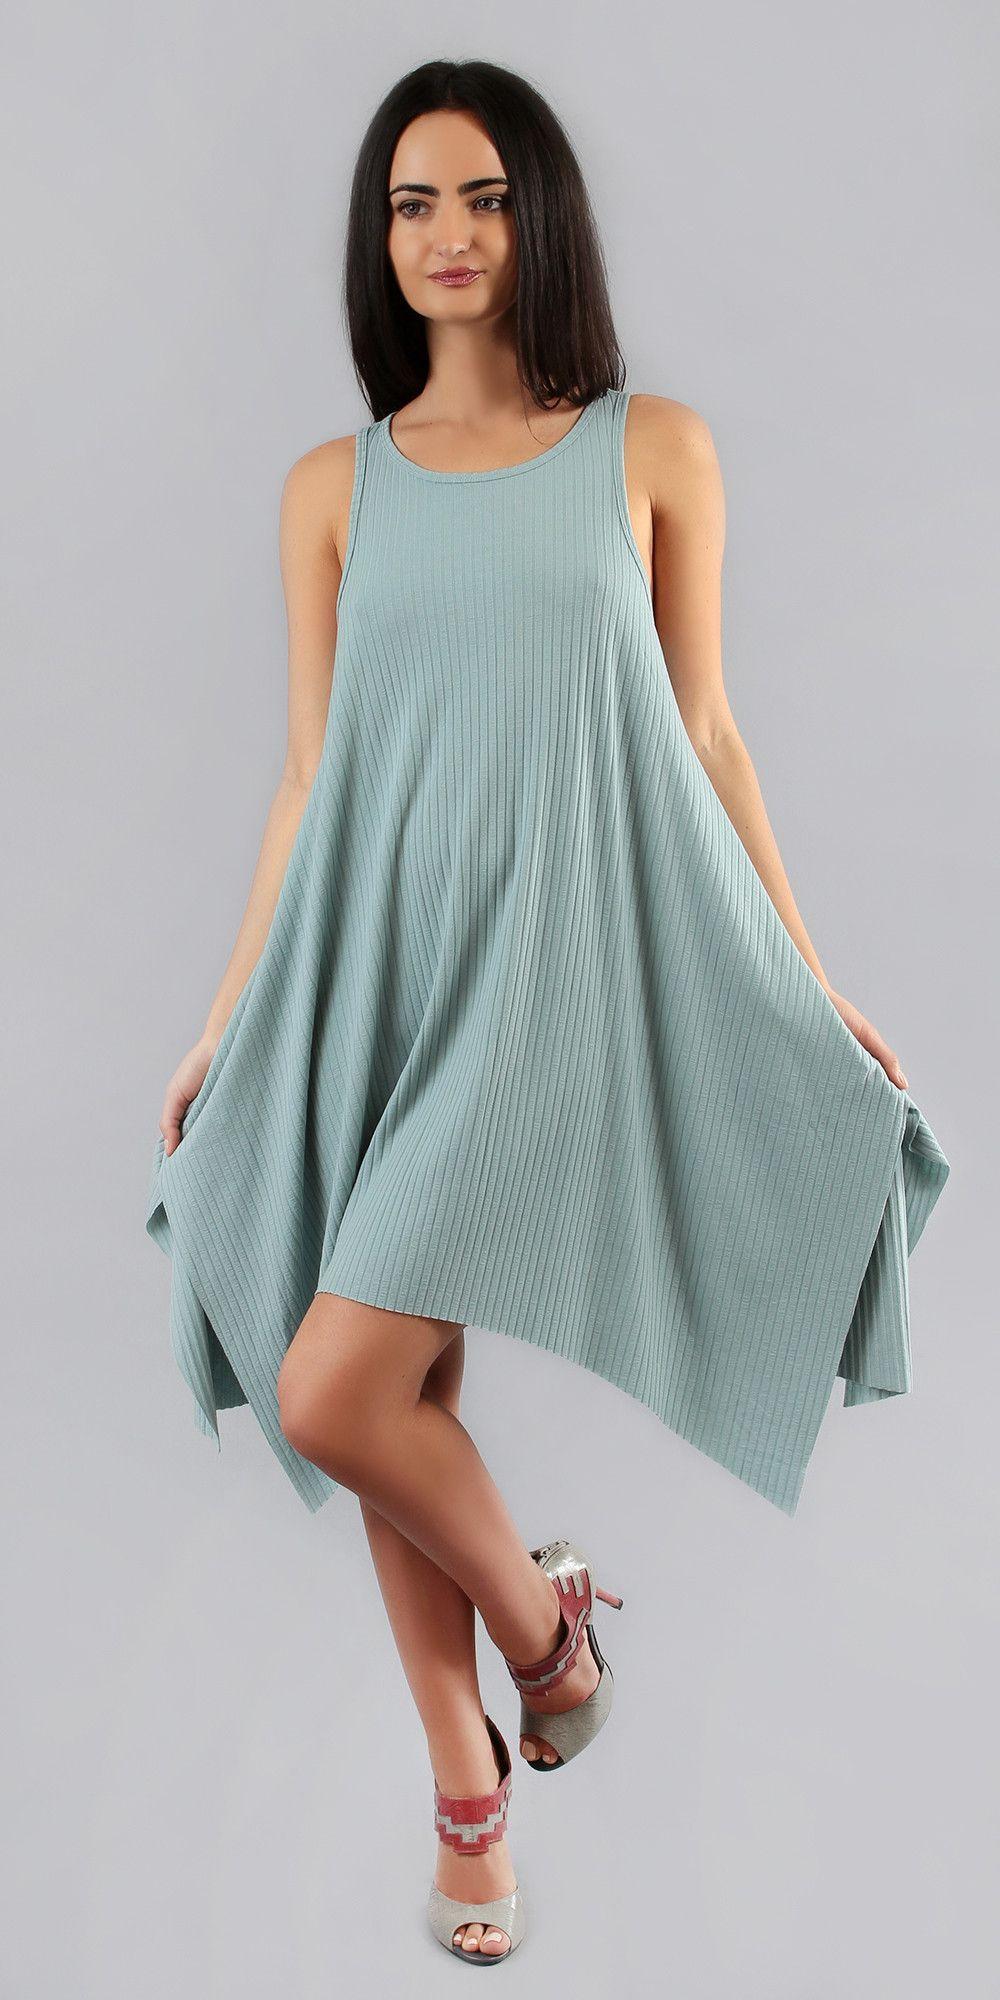 Asymmetrical ribbed tank dress ribbed tank dress